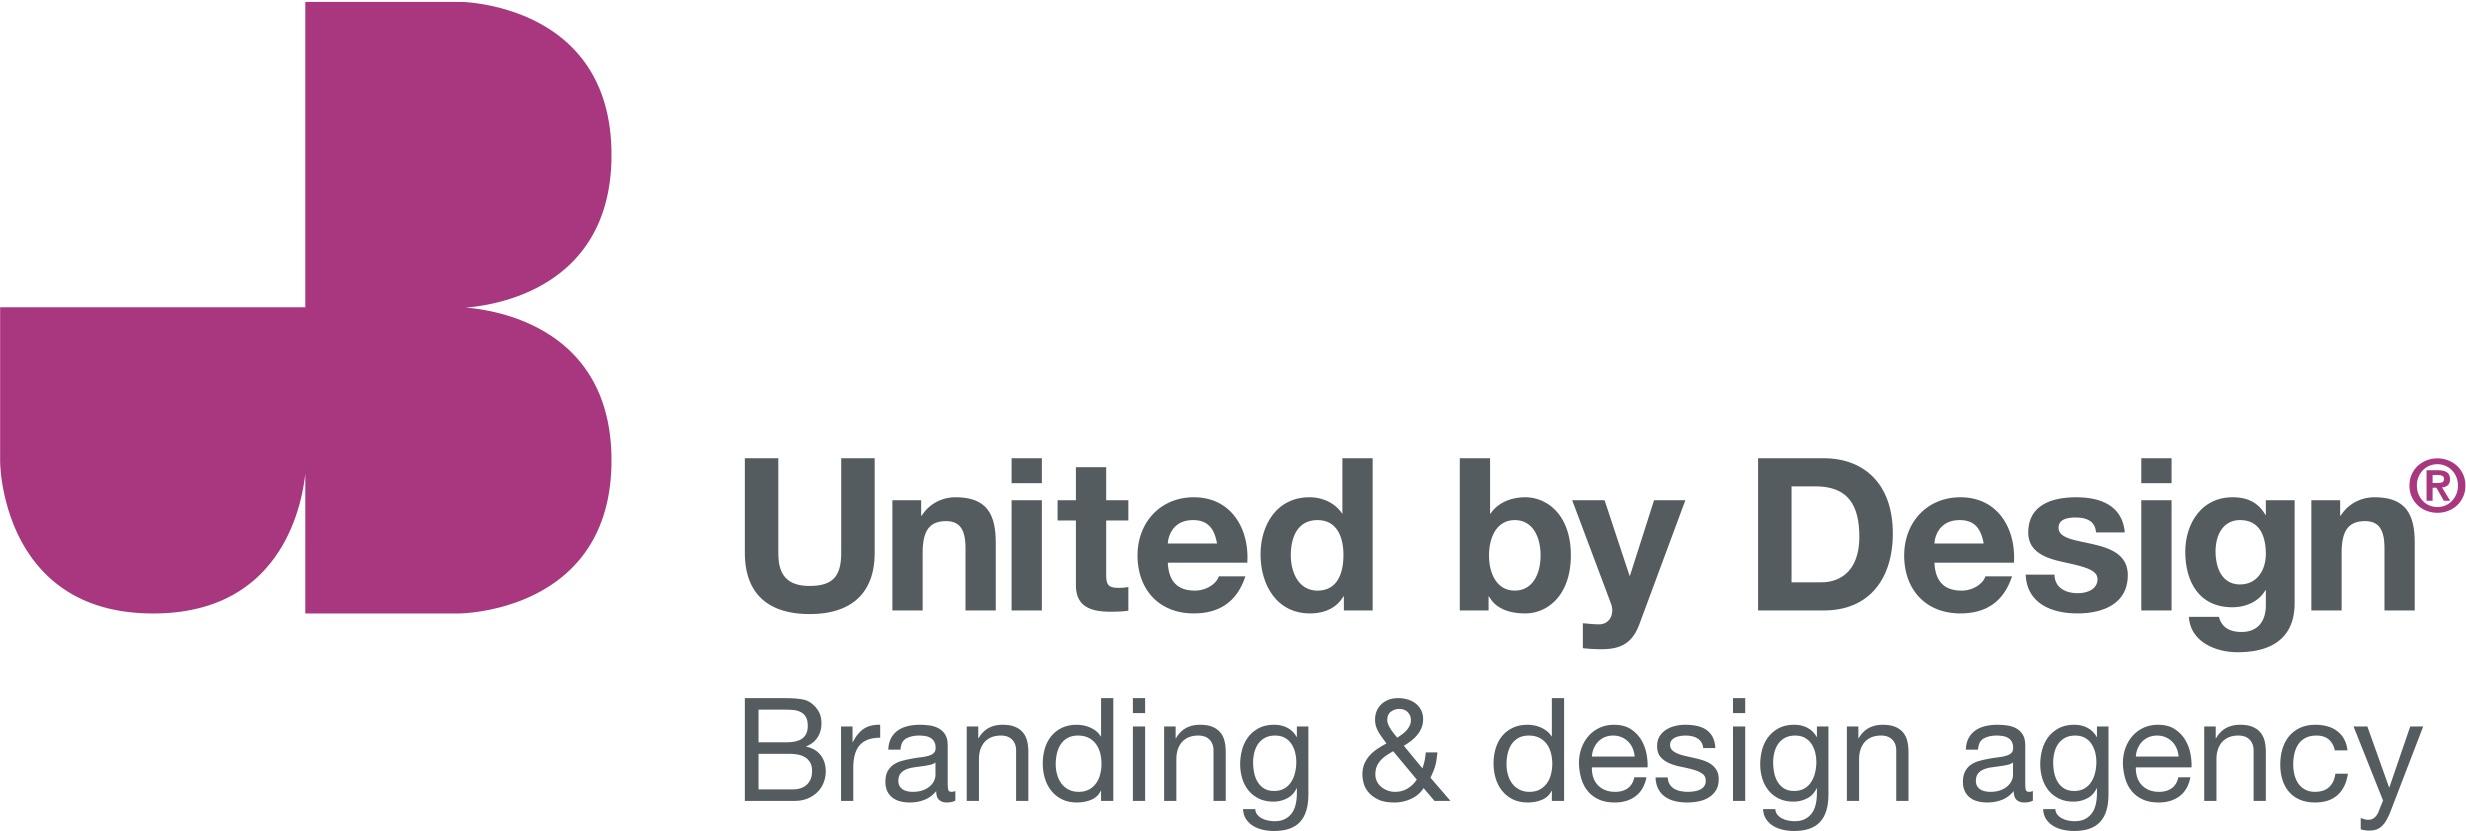 ubd Logo.jpg